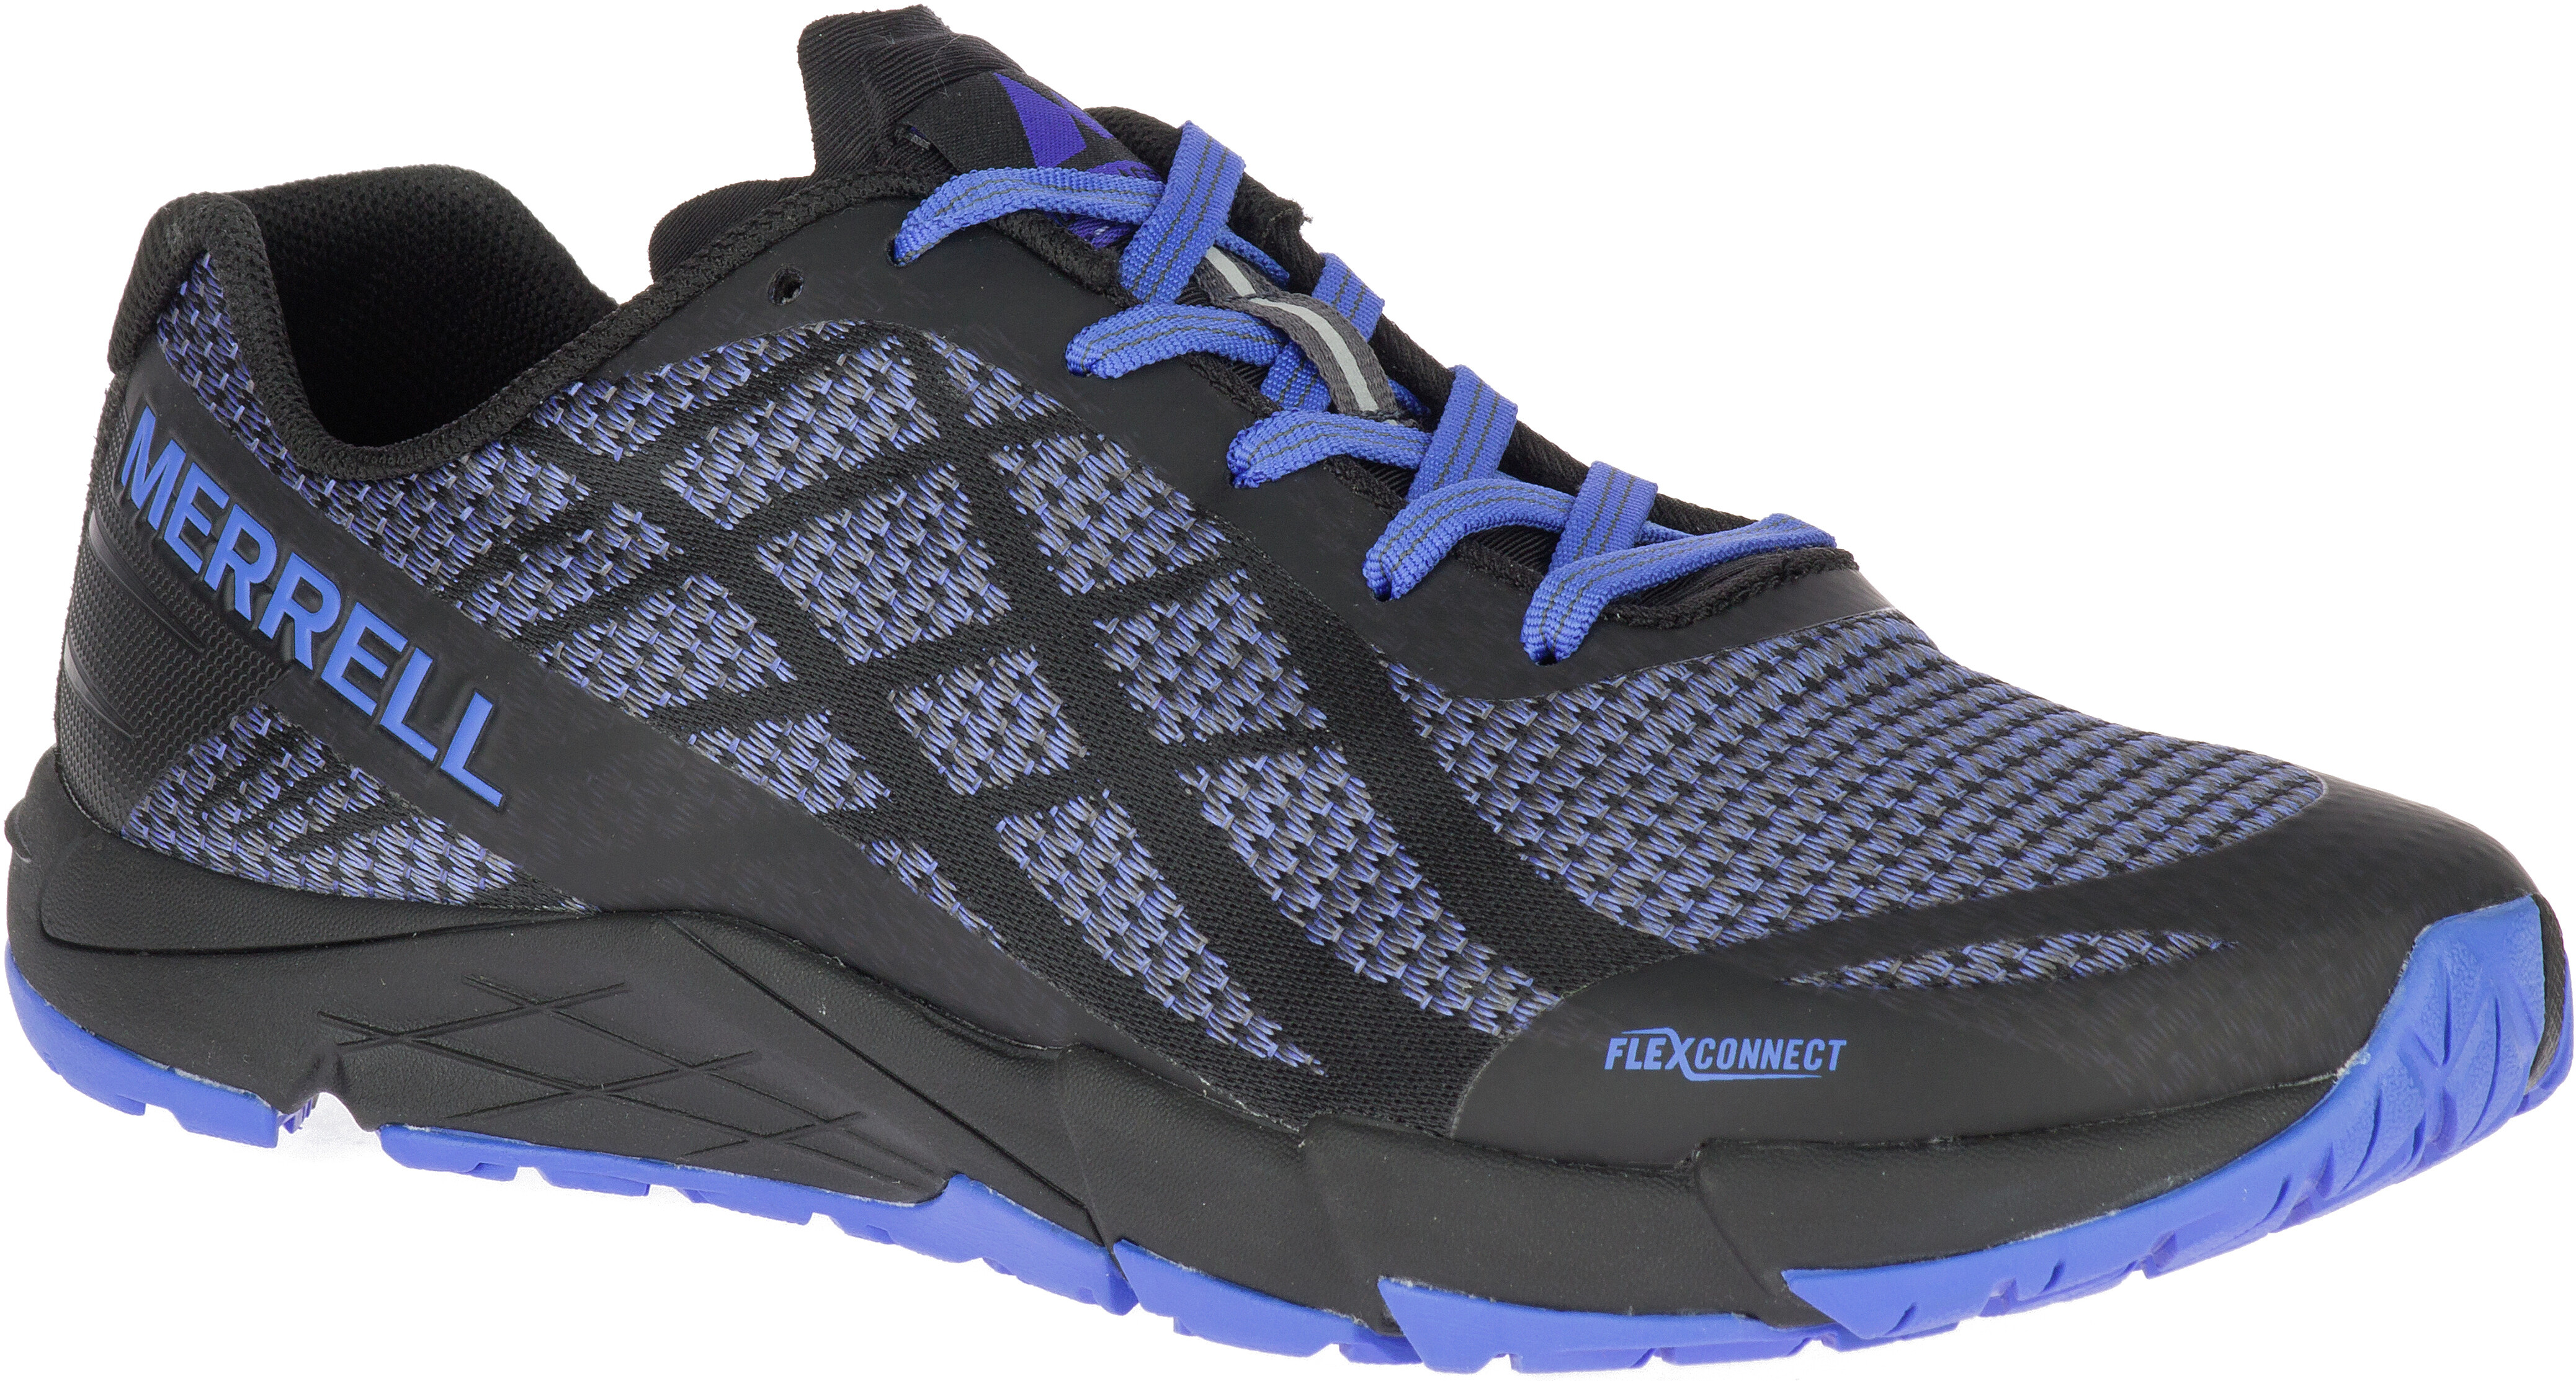 26a7614e8fbed Merrell Bare Access Flex Shield Buty do biegania Kobiety niebieski/czarny